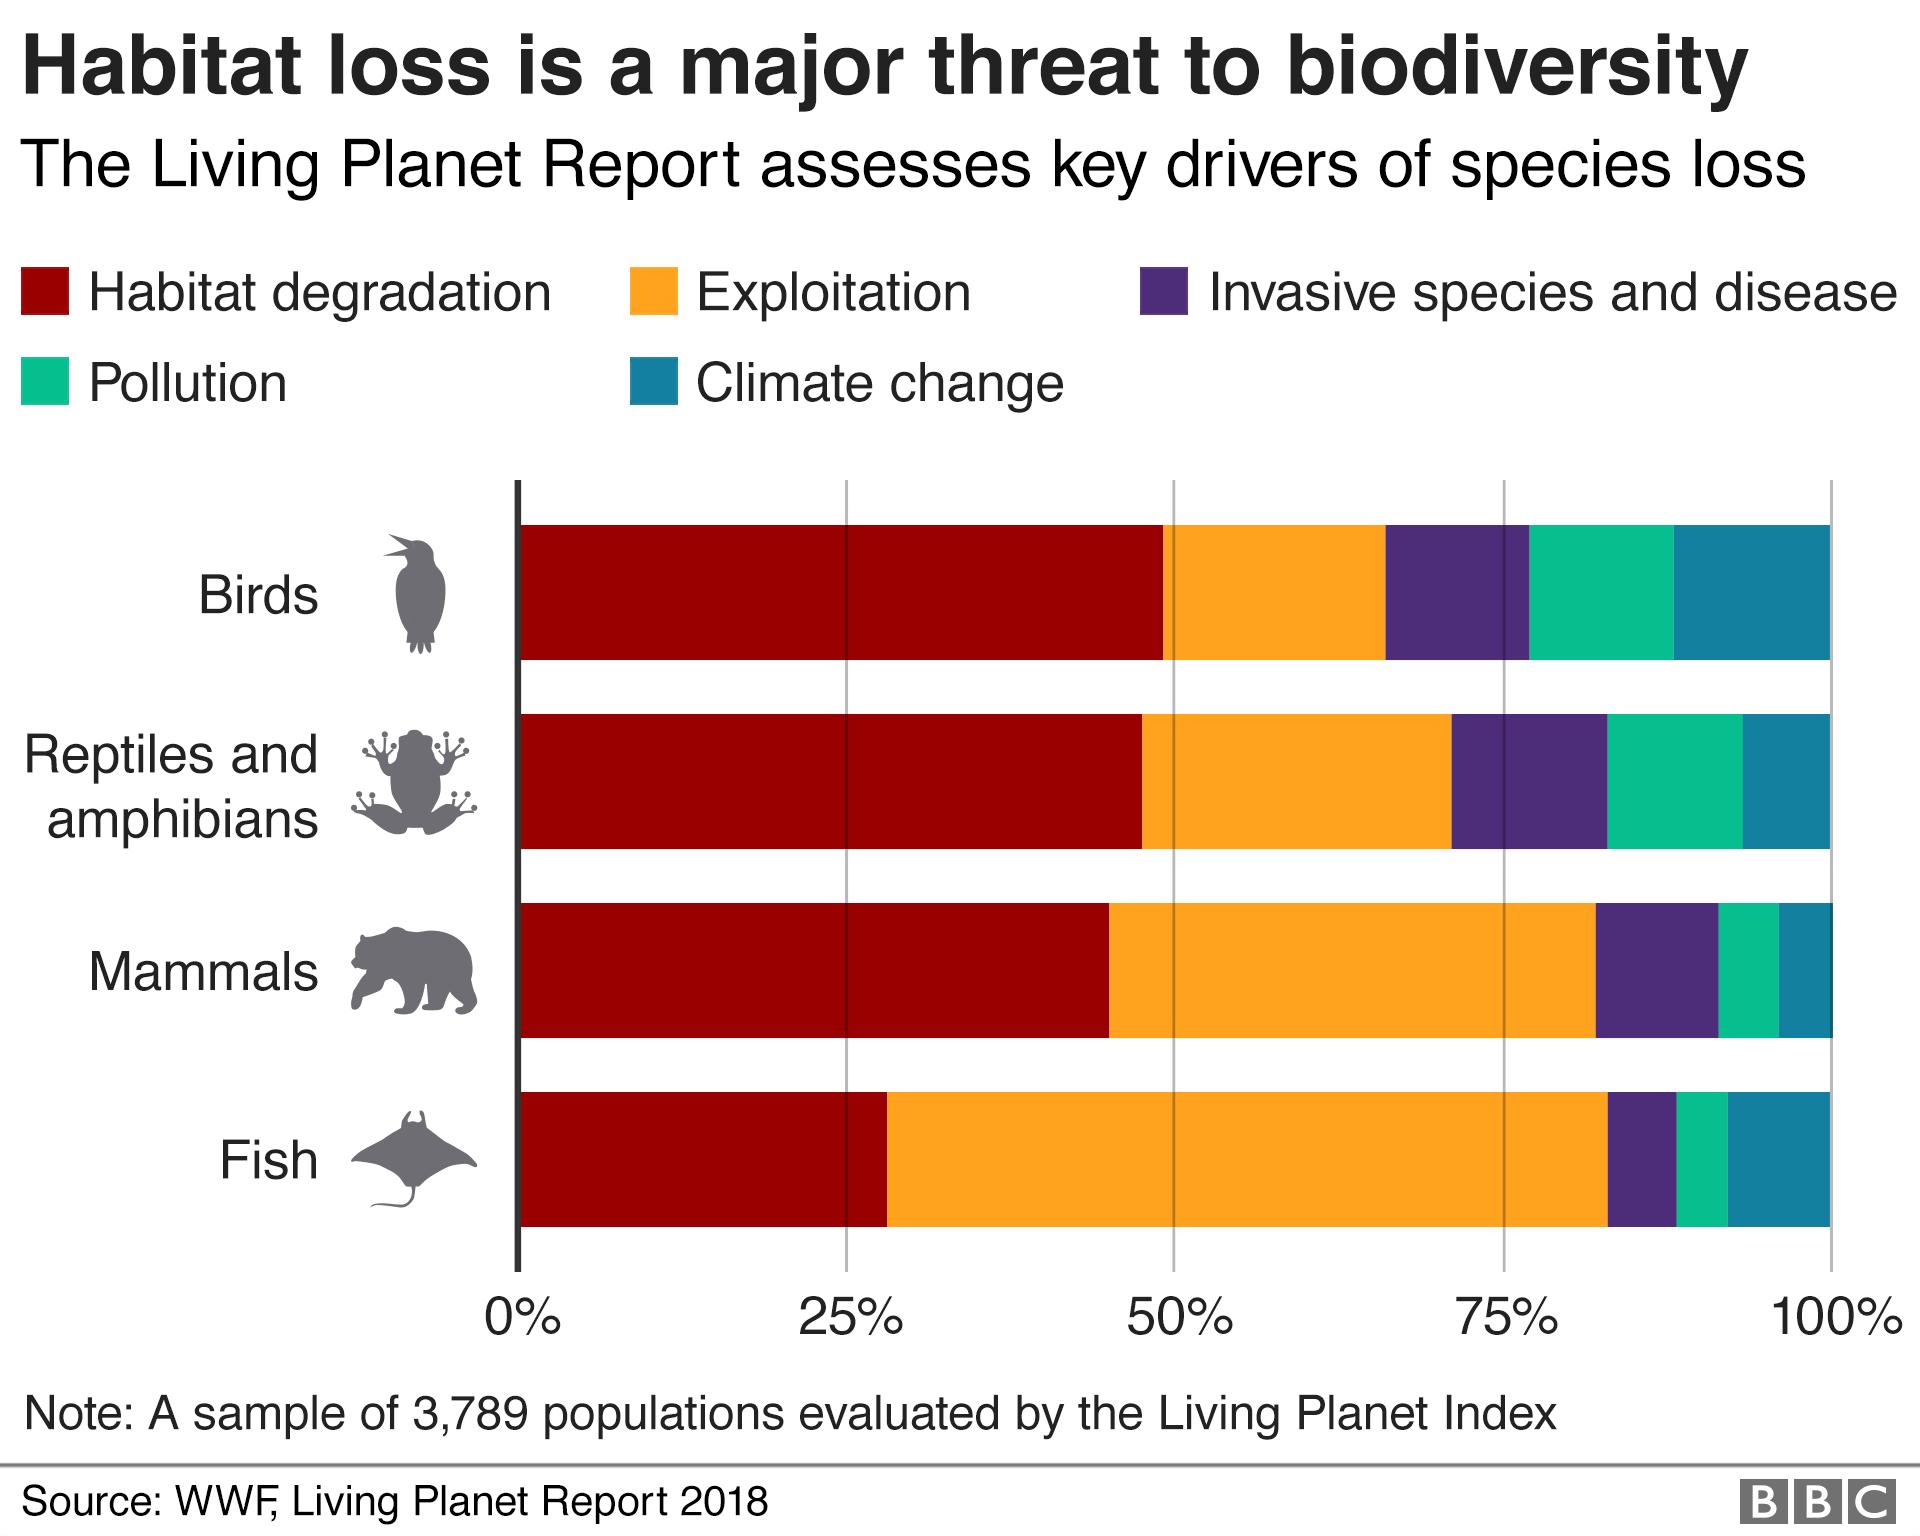 Biodiversity drivers